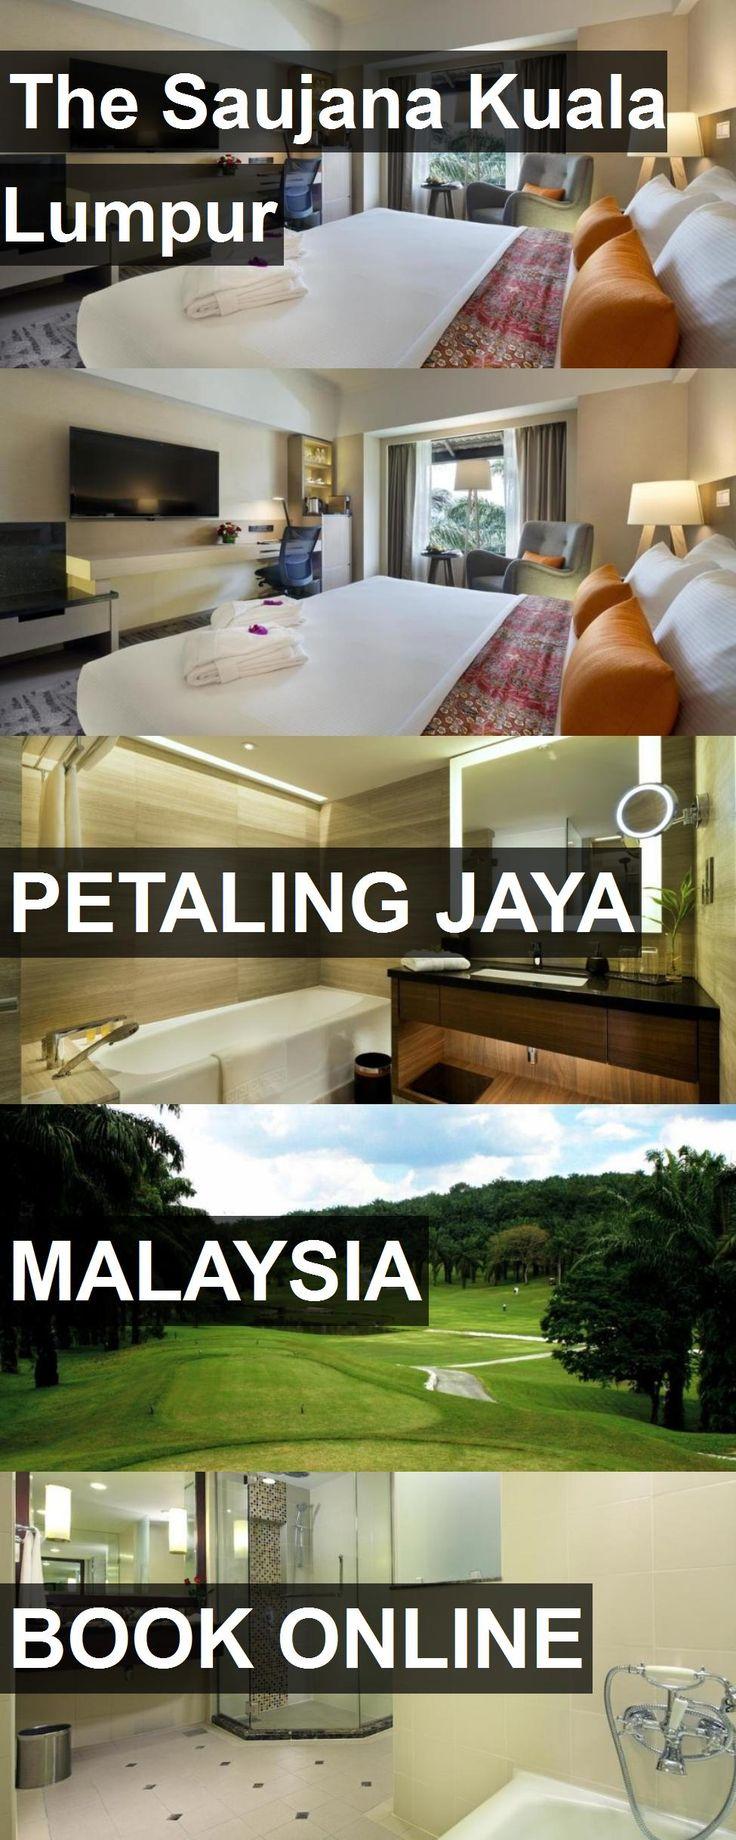 Hotel The Saujana Kuala Lumpur in Petaling Jaya, Malaysia. For more information, photos, reviews and best prices please follow the link. #Malaysia #PetalingJaya #travel #vacation #hotel